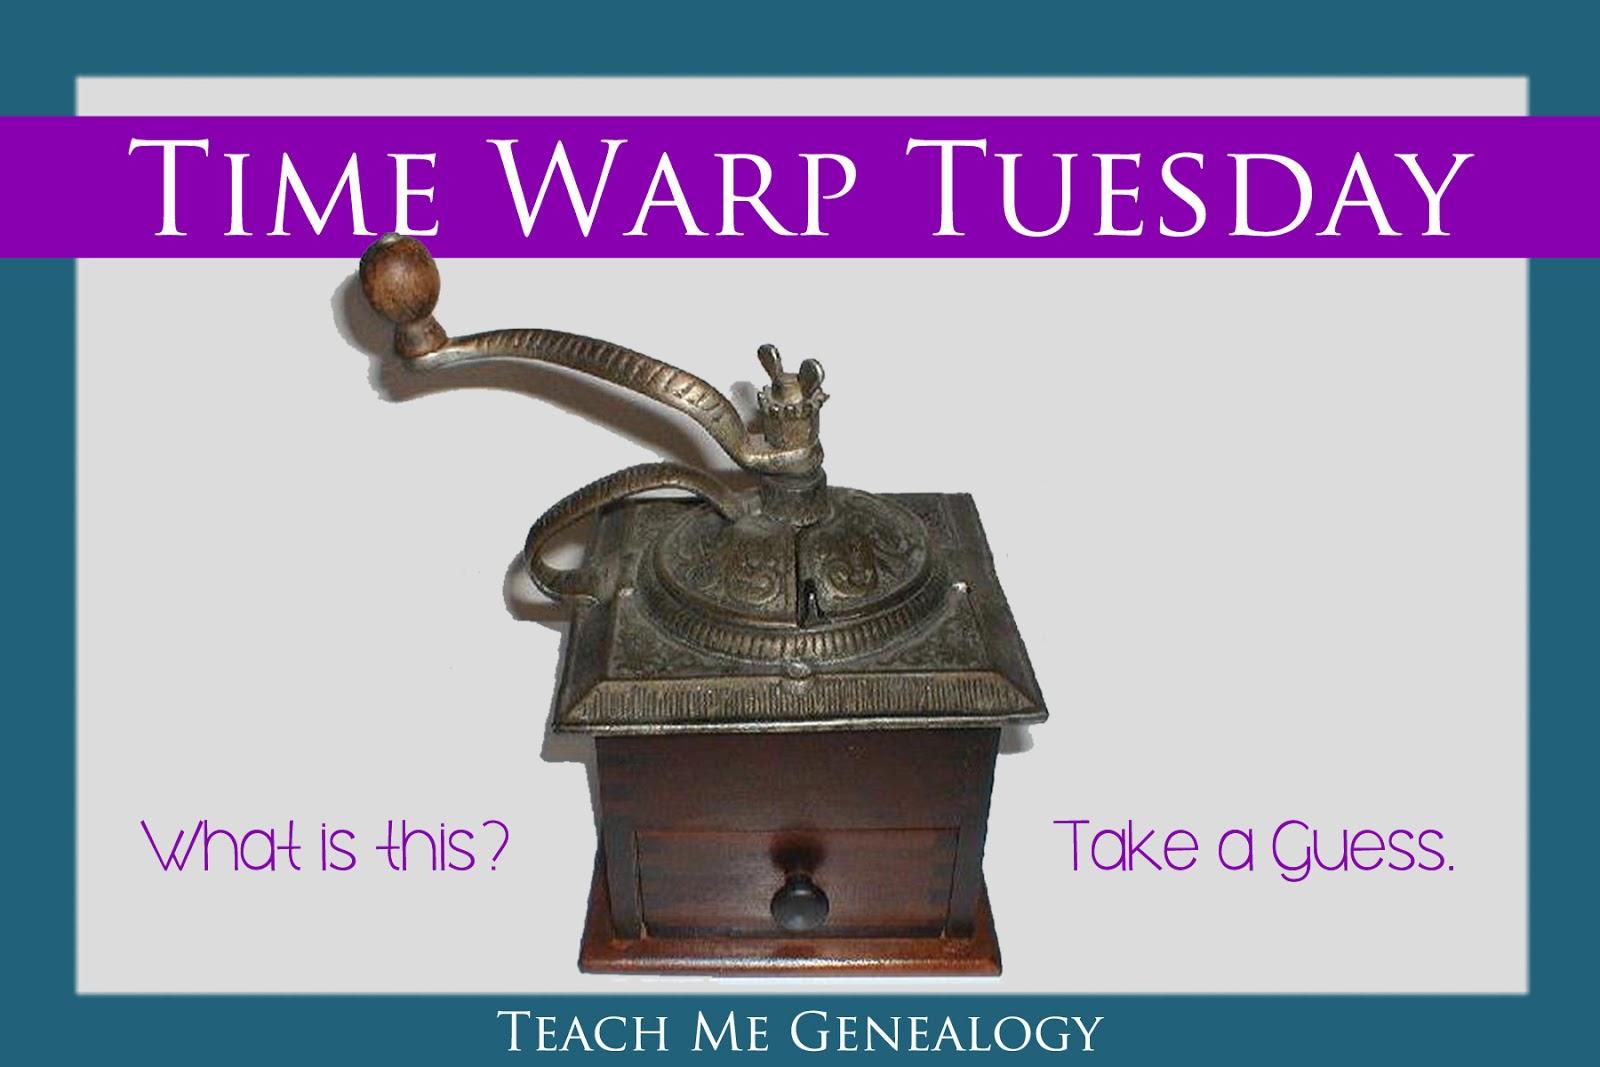 Time Warp Tuesday